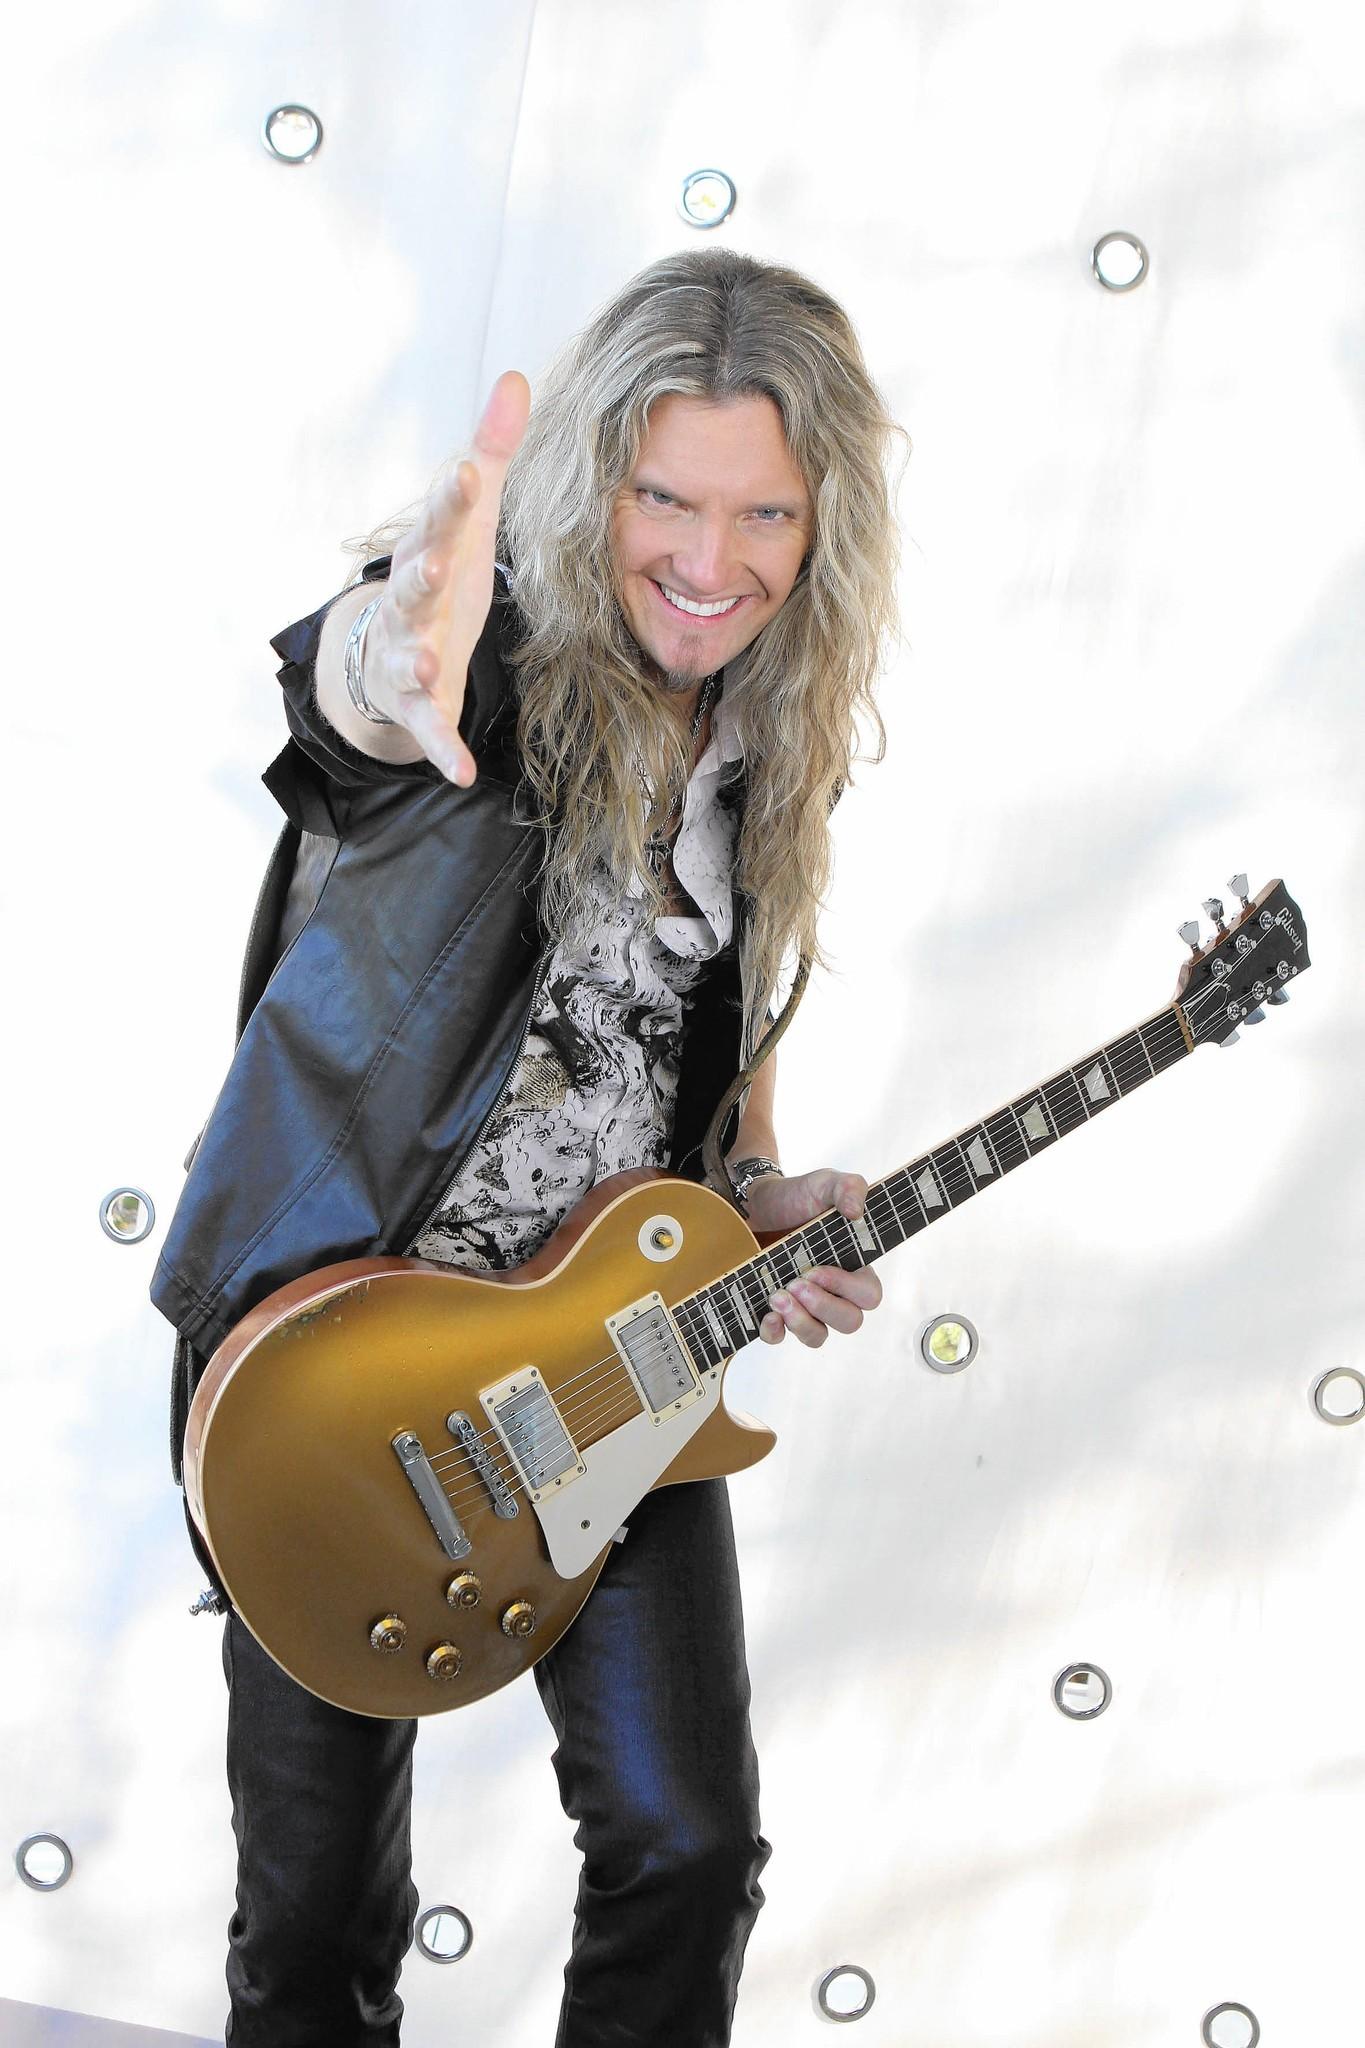 Local guy livens up Whitesnake shows - Aurora Beacon-News